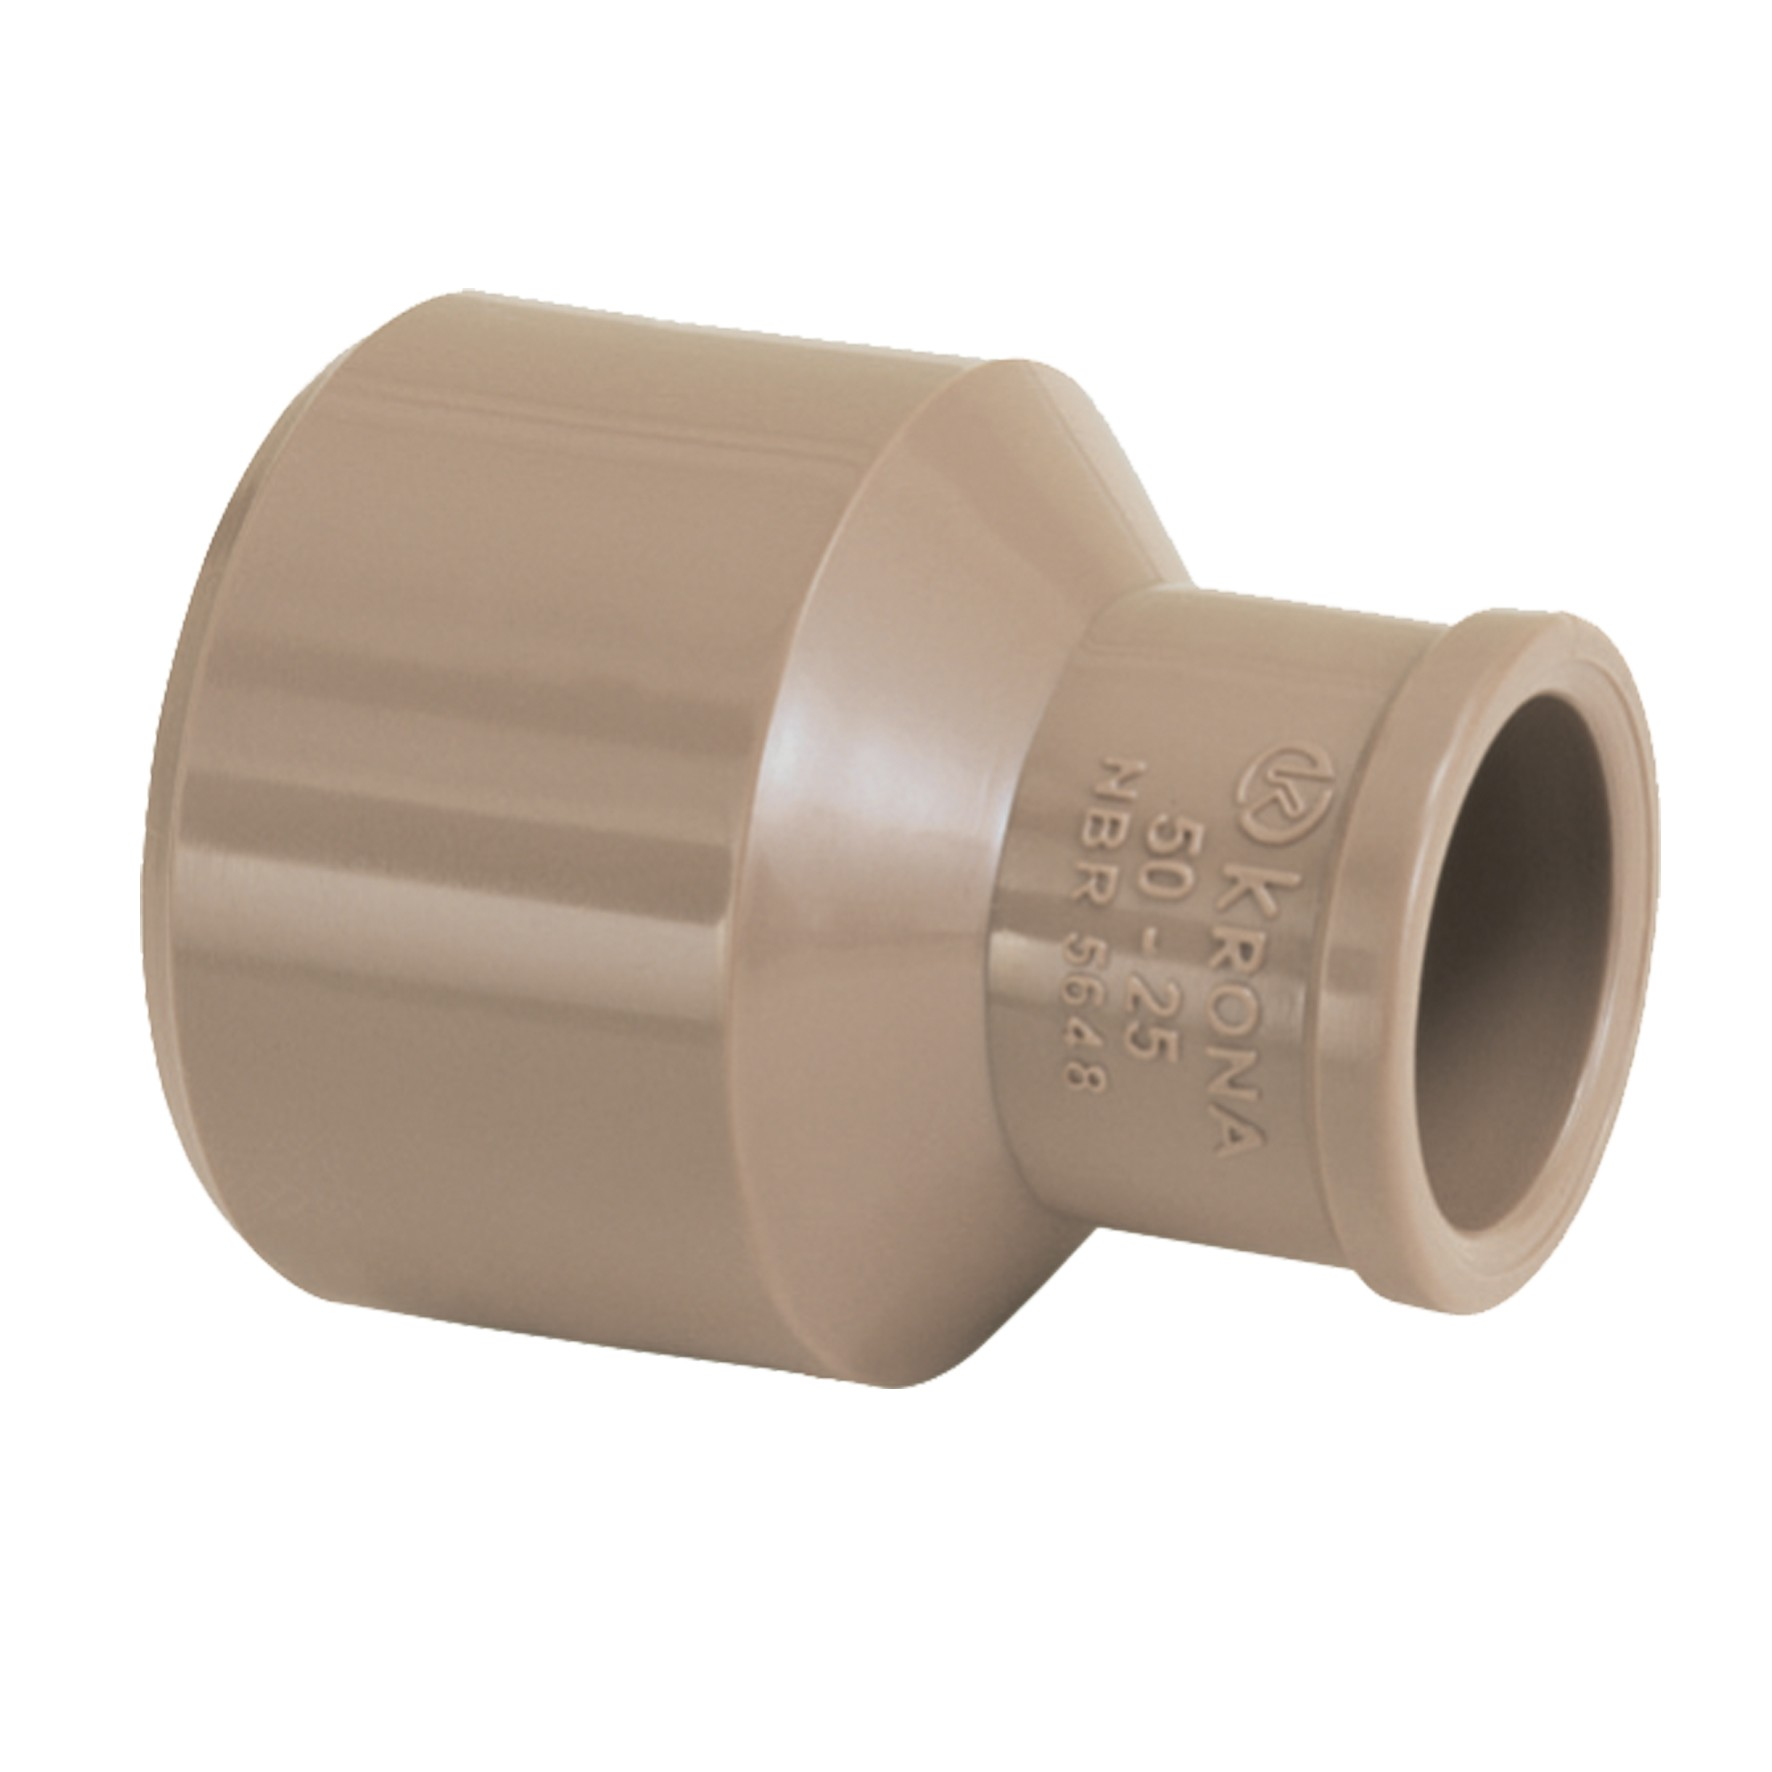 Bucha Longa Simples Soldavel PVC 40mm - Krona